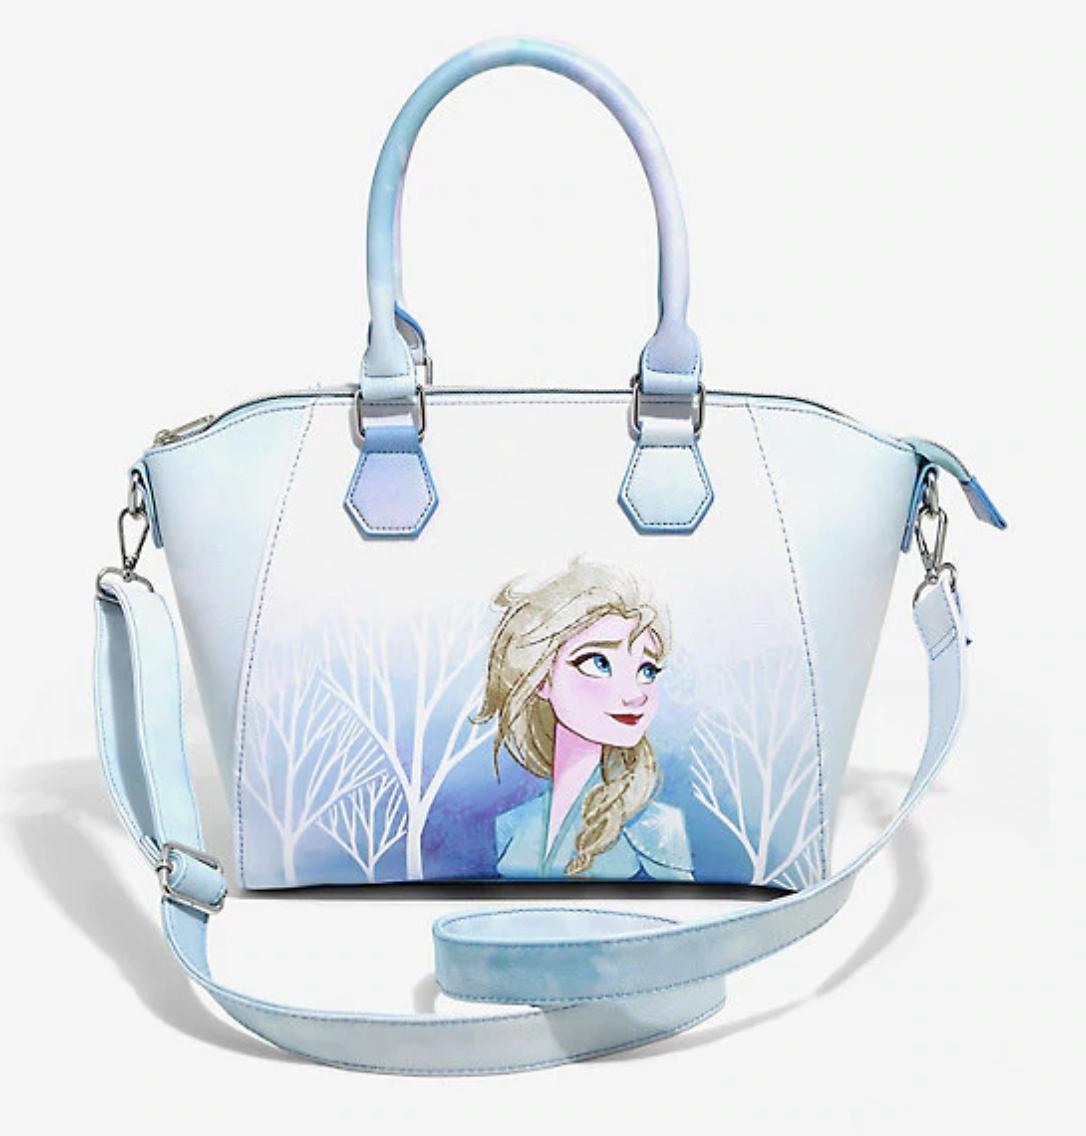 Frozen 2 Elsa Purse Loungefly